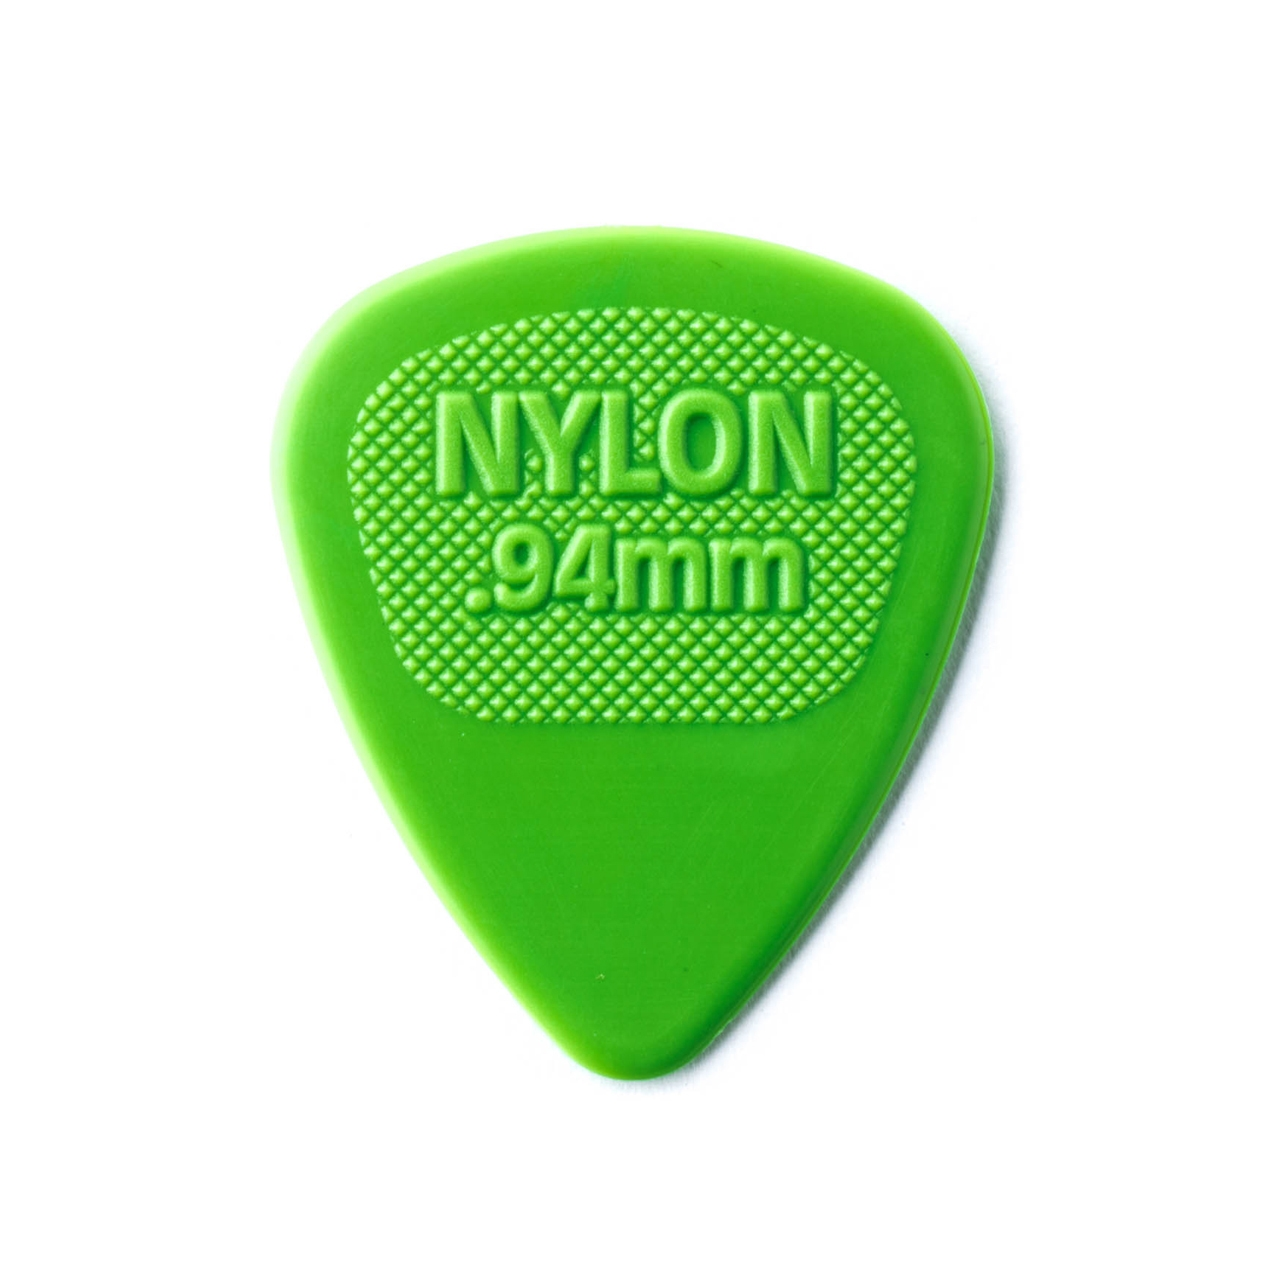 Palheta Nylon Midi 0,94mm Verde Pct C/72 443r.94 Dunlop  - Audio Video & cia